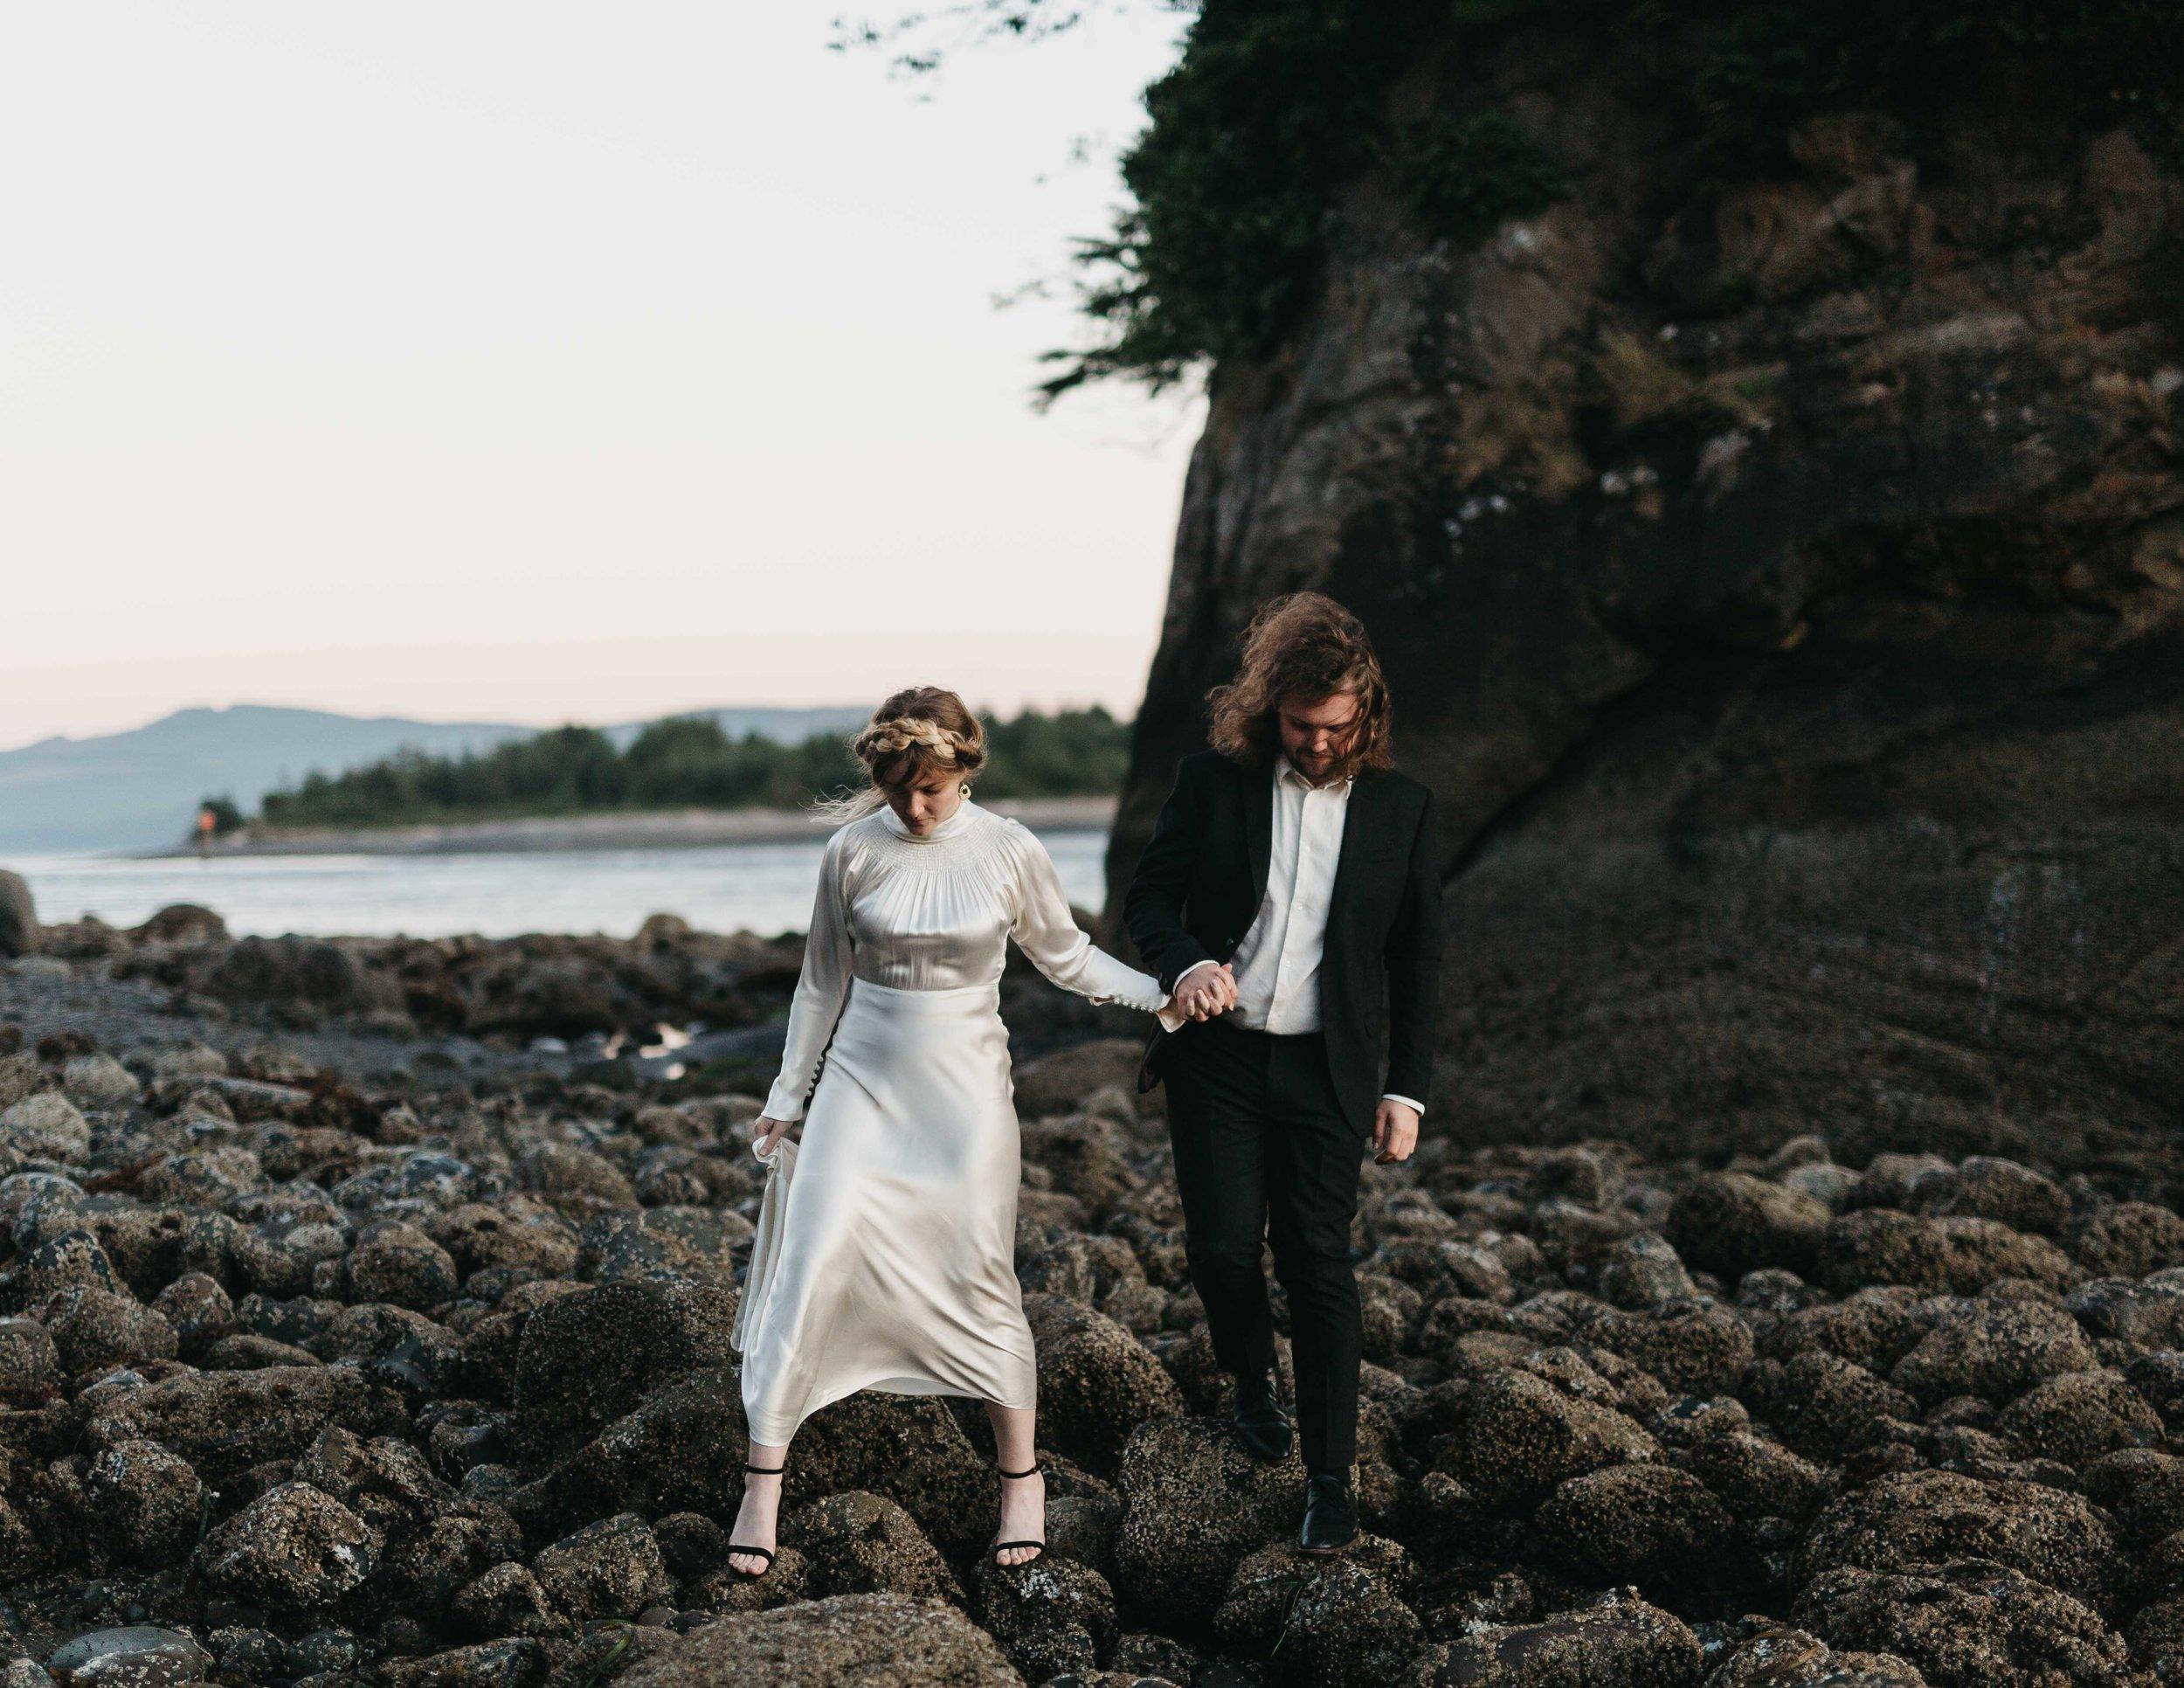 Oregon-Wedding-Photographer-11.jpg